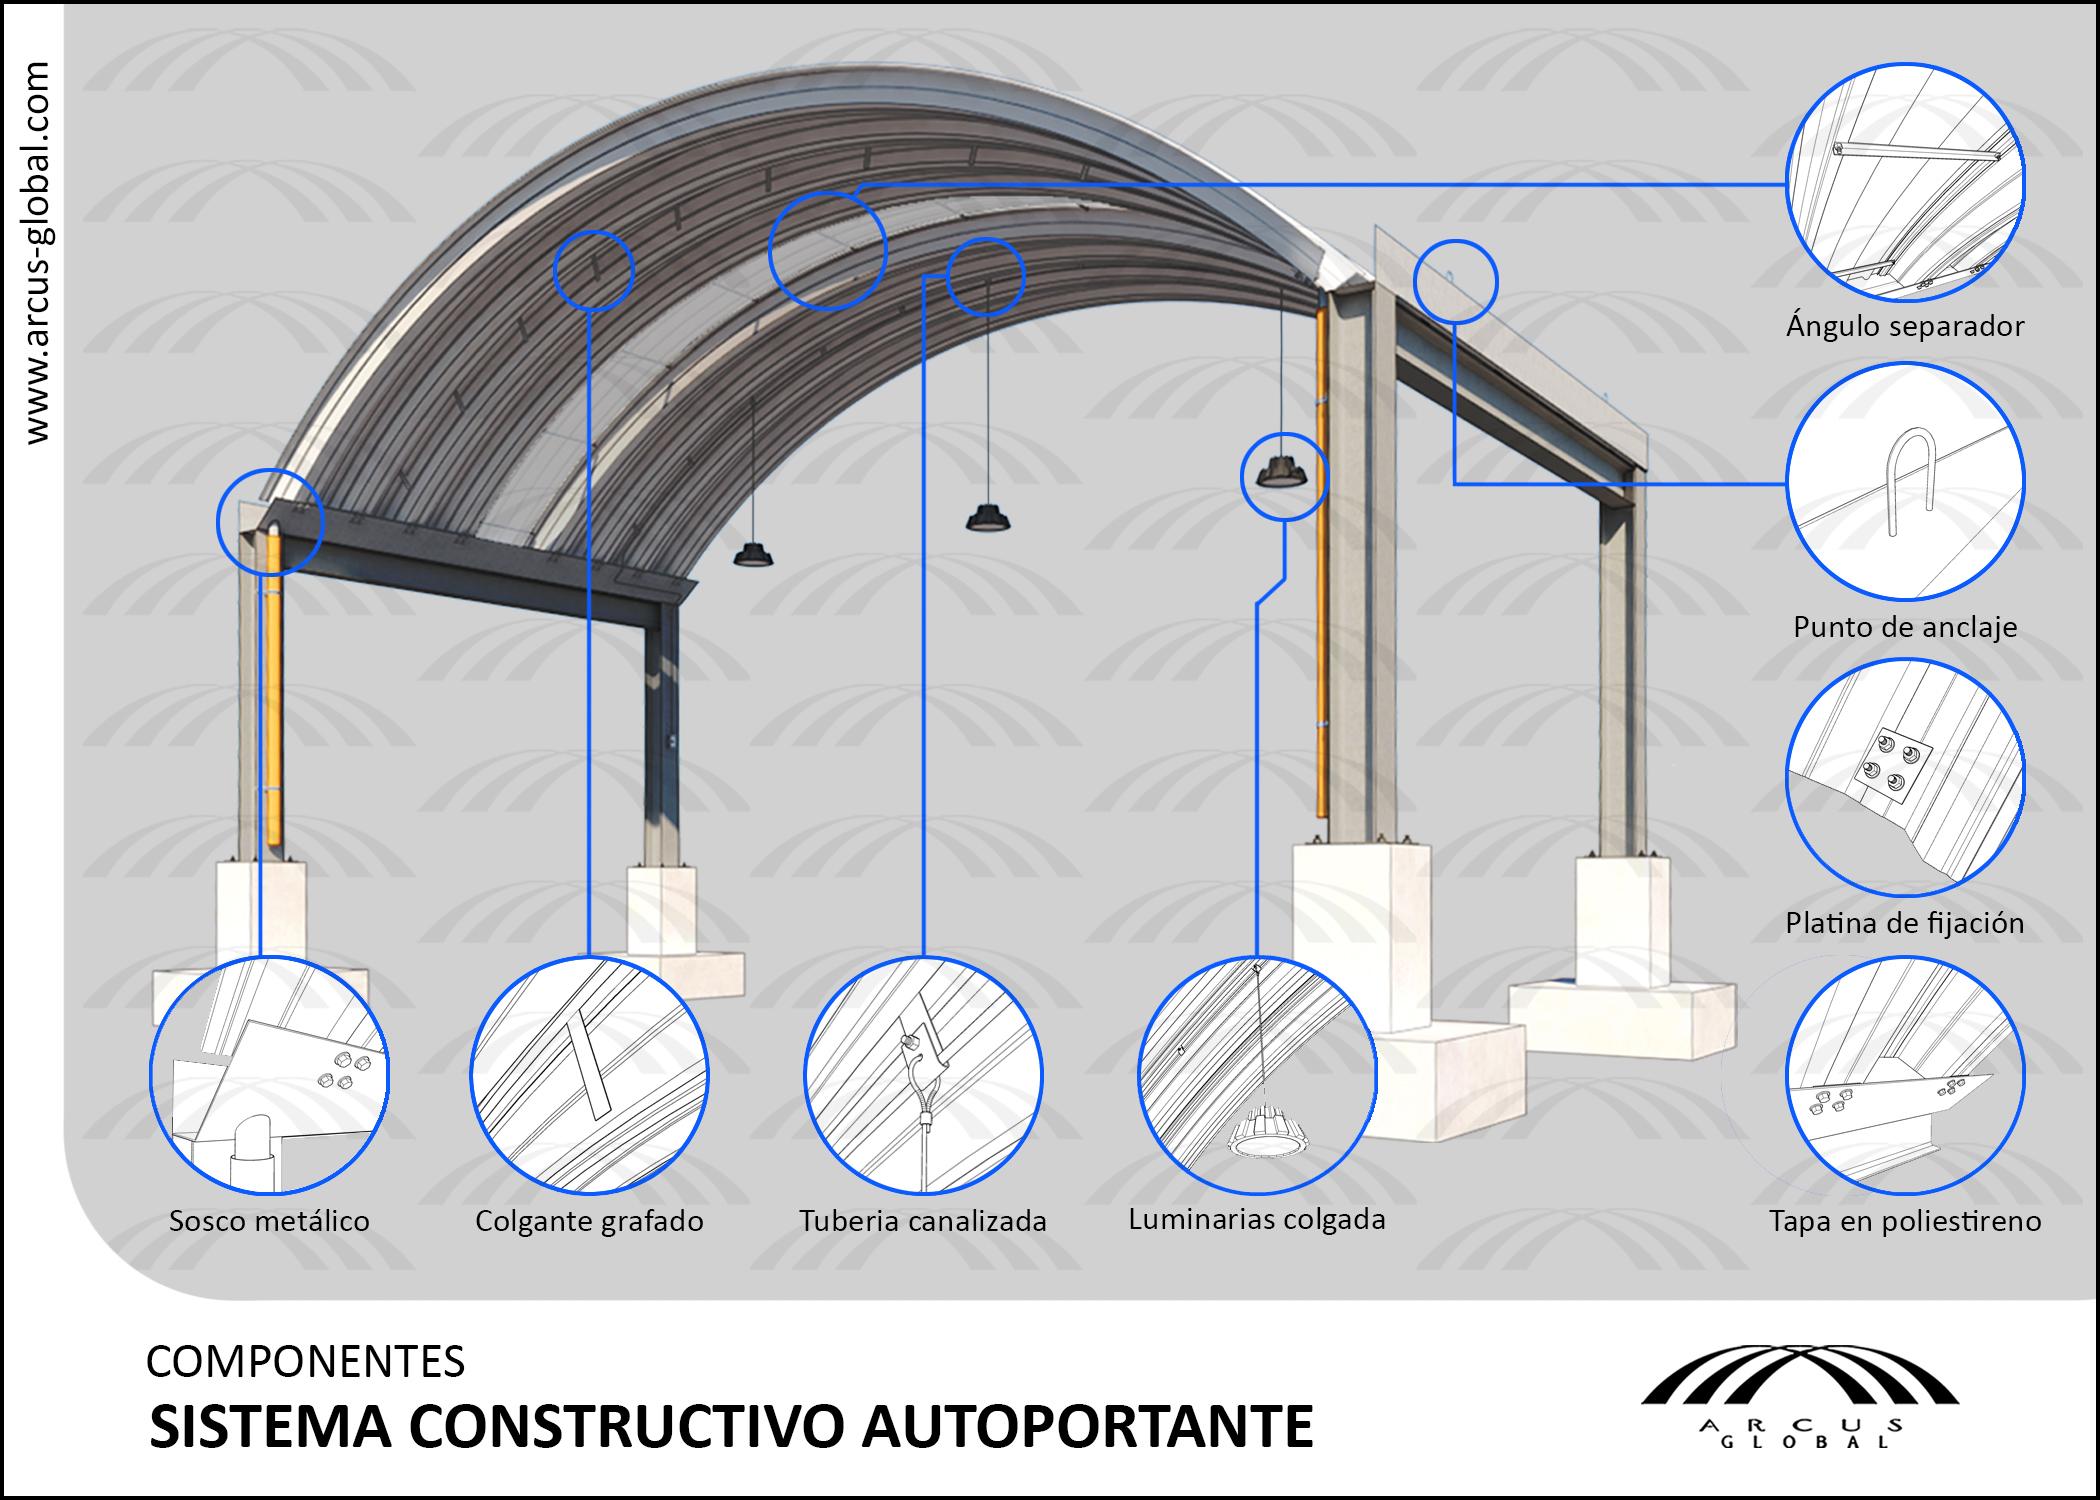 Ficha técnica: Componentes sistema constructivo autoportante